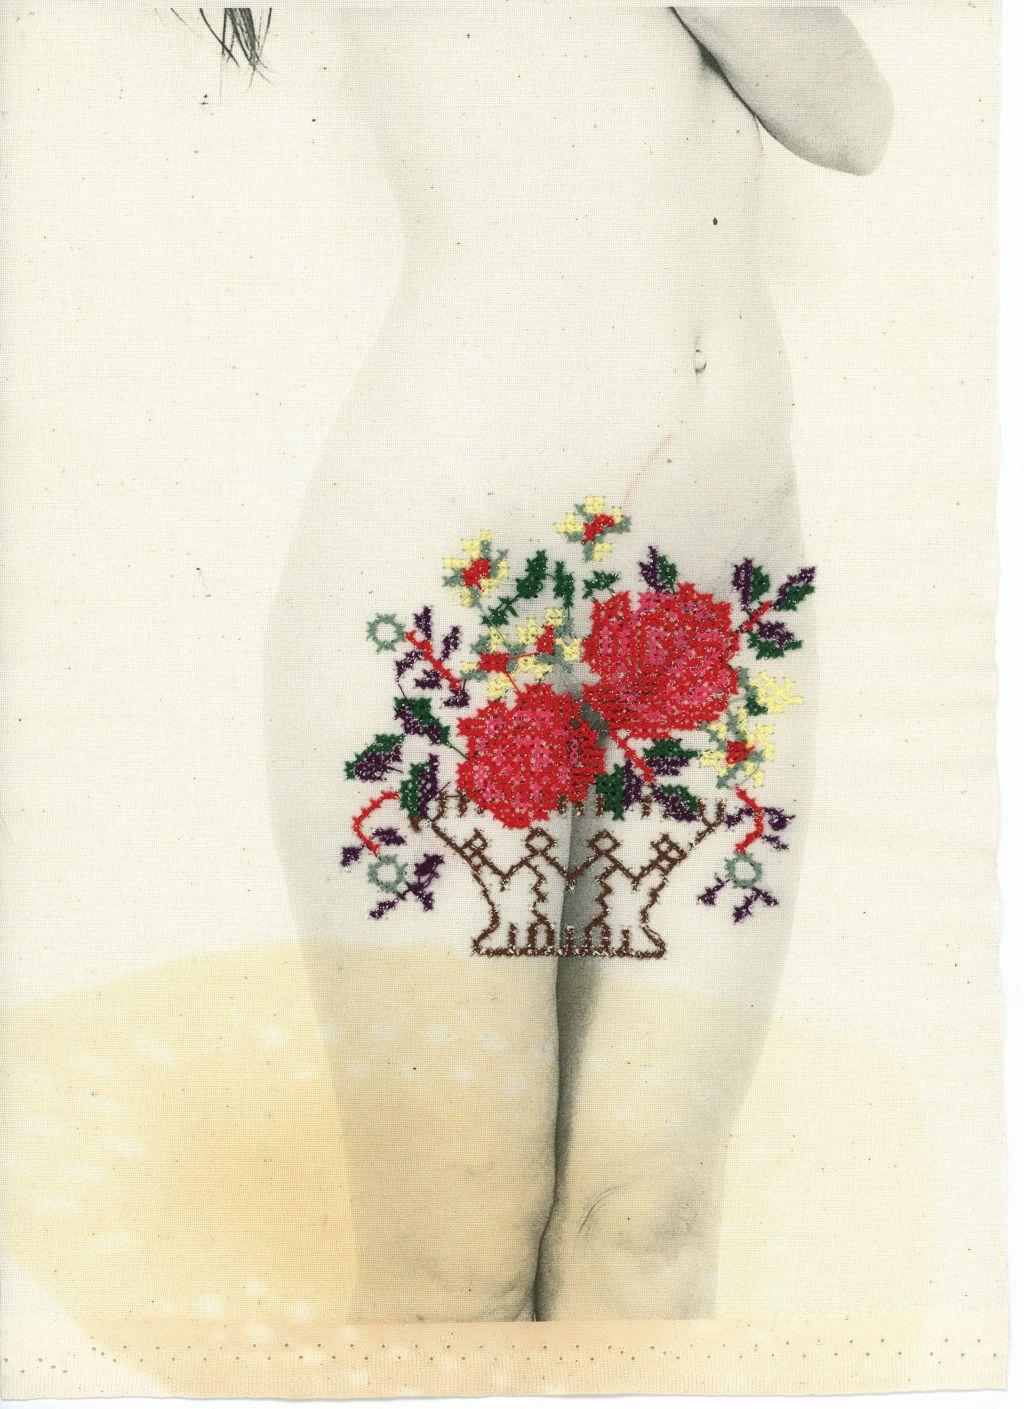 Łono natury, avers, druk na płótnie, haft. 29 x 21 cm, 2014/16